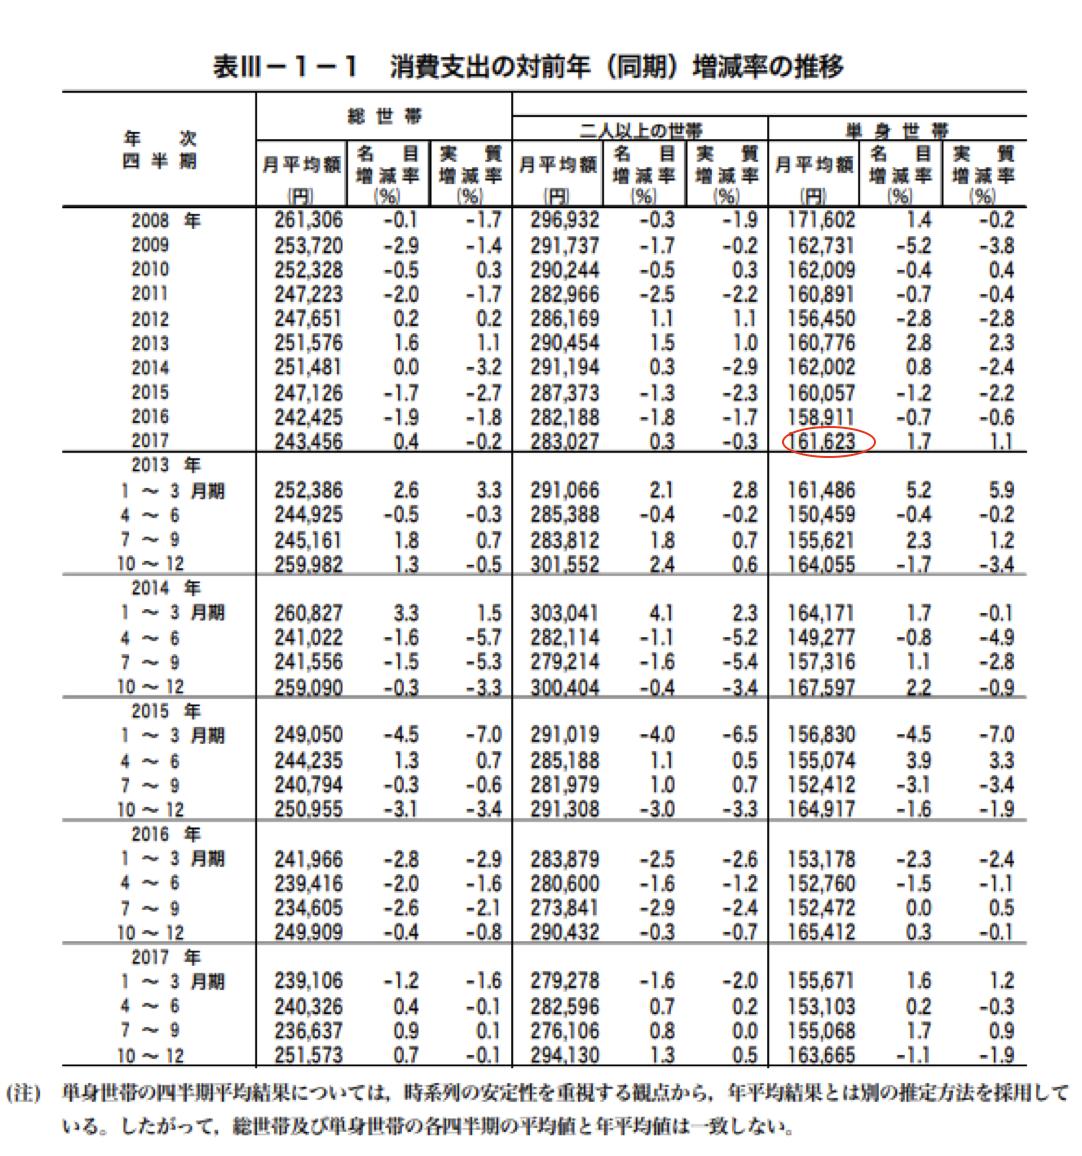 消費支出の対前年(同期)増減率の推移